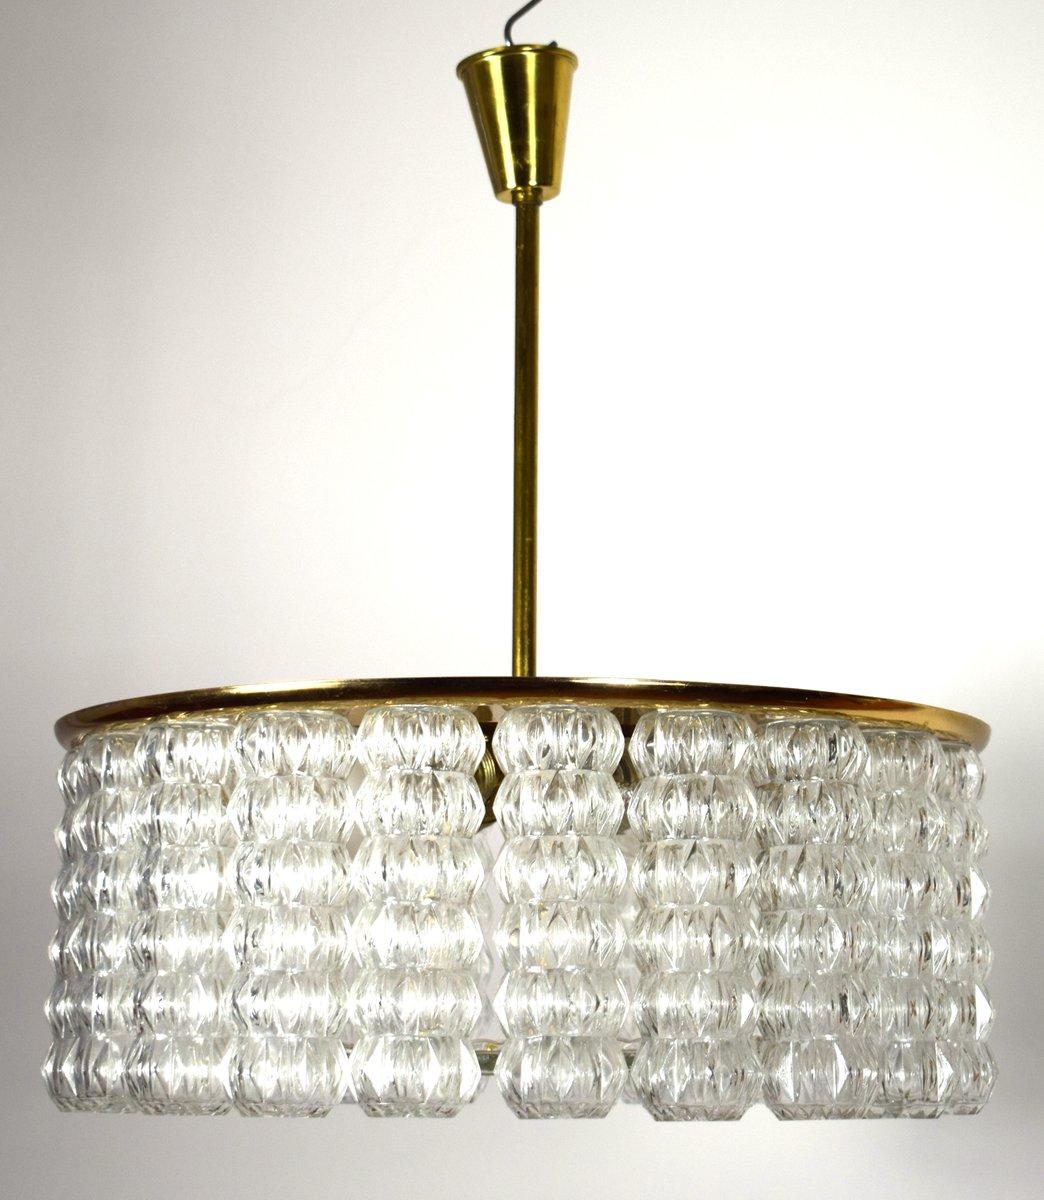 Gro e messing glas deckenlampe 1960er bei pamono kaufen for Deckenlampe messing